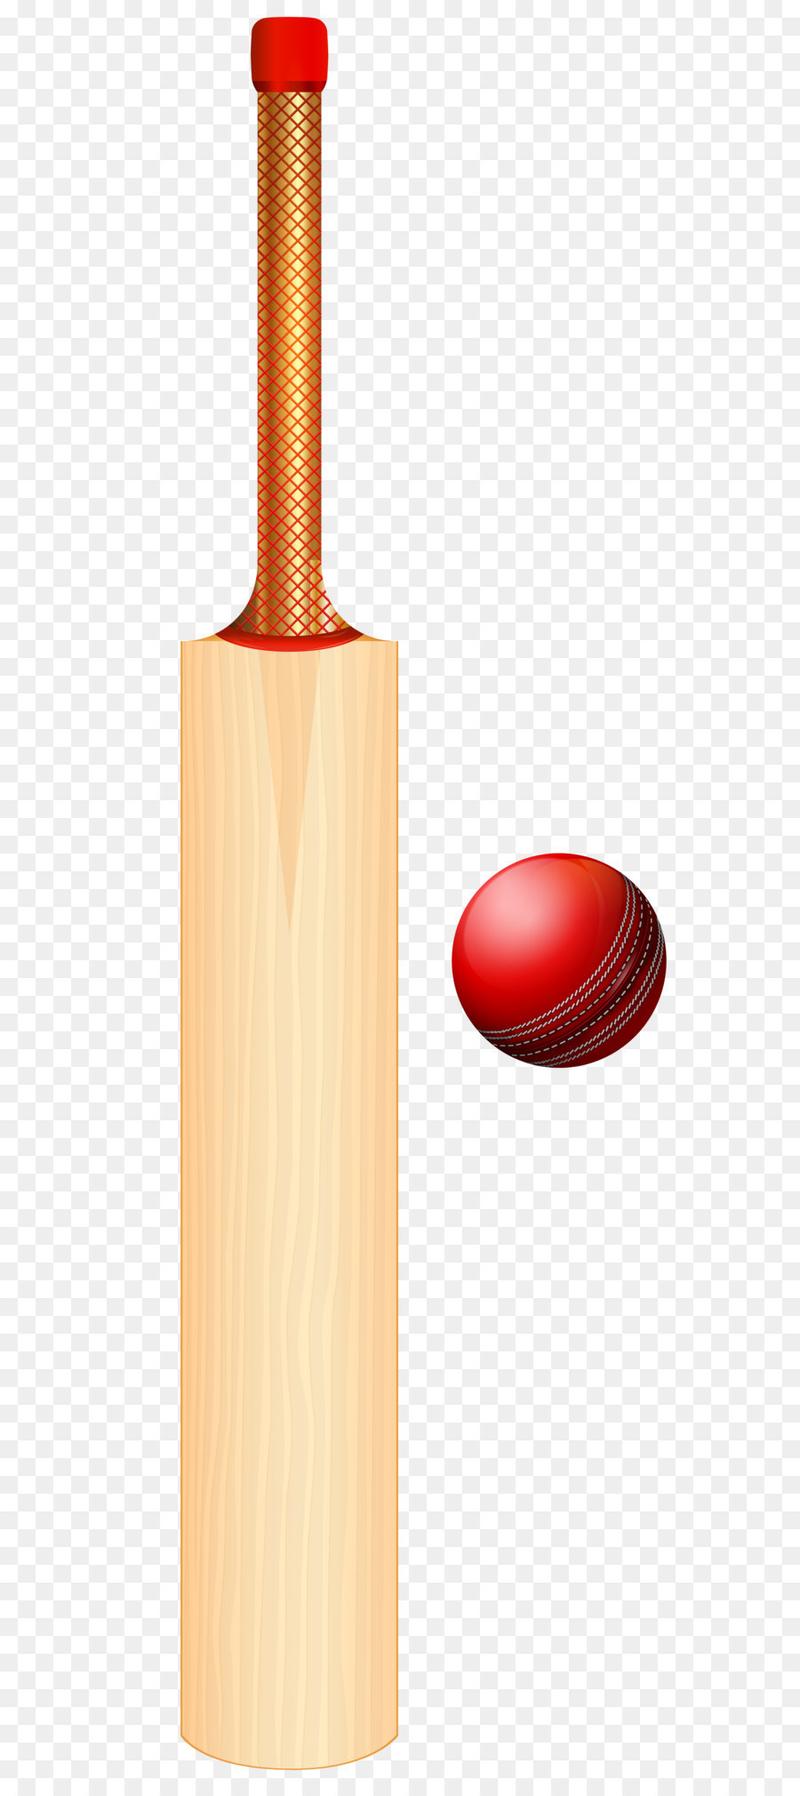 Cricket ball and bat clipart clip freeuse library Download Free png Cricket bat Batting Clip art - DLPNG.com clip freeuse library